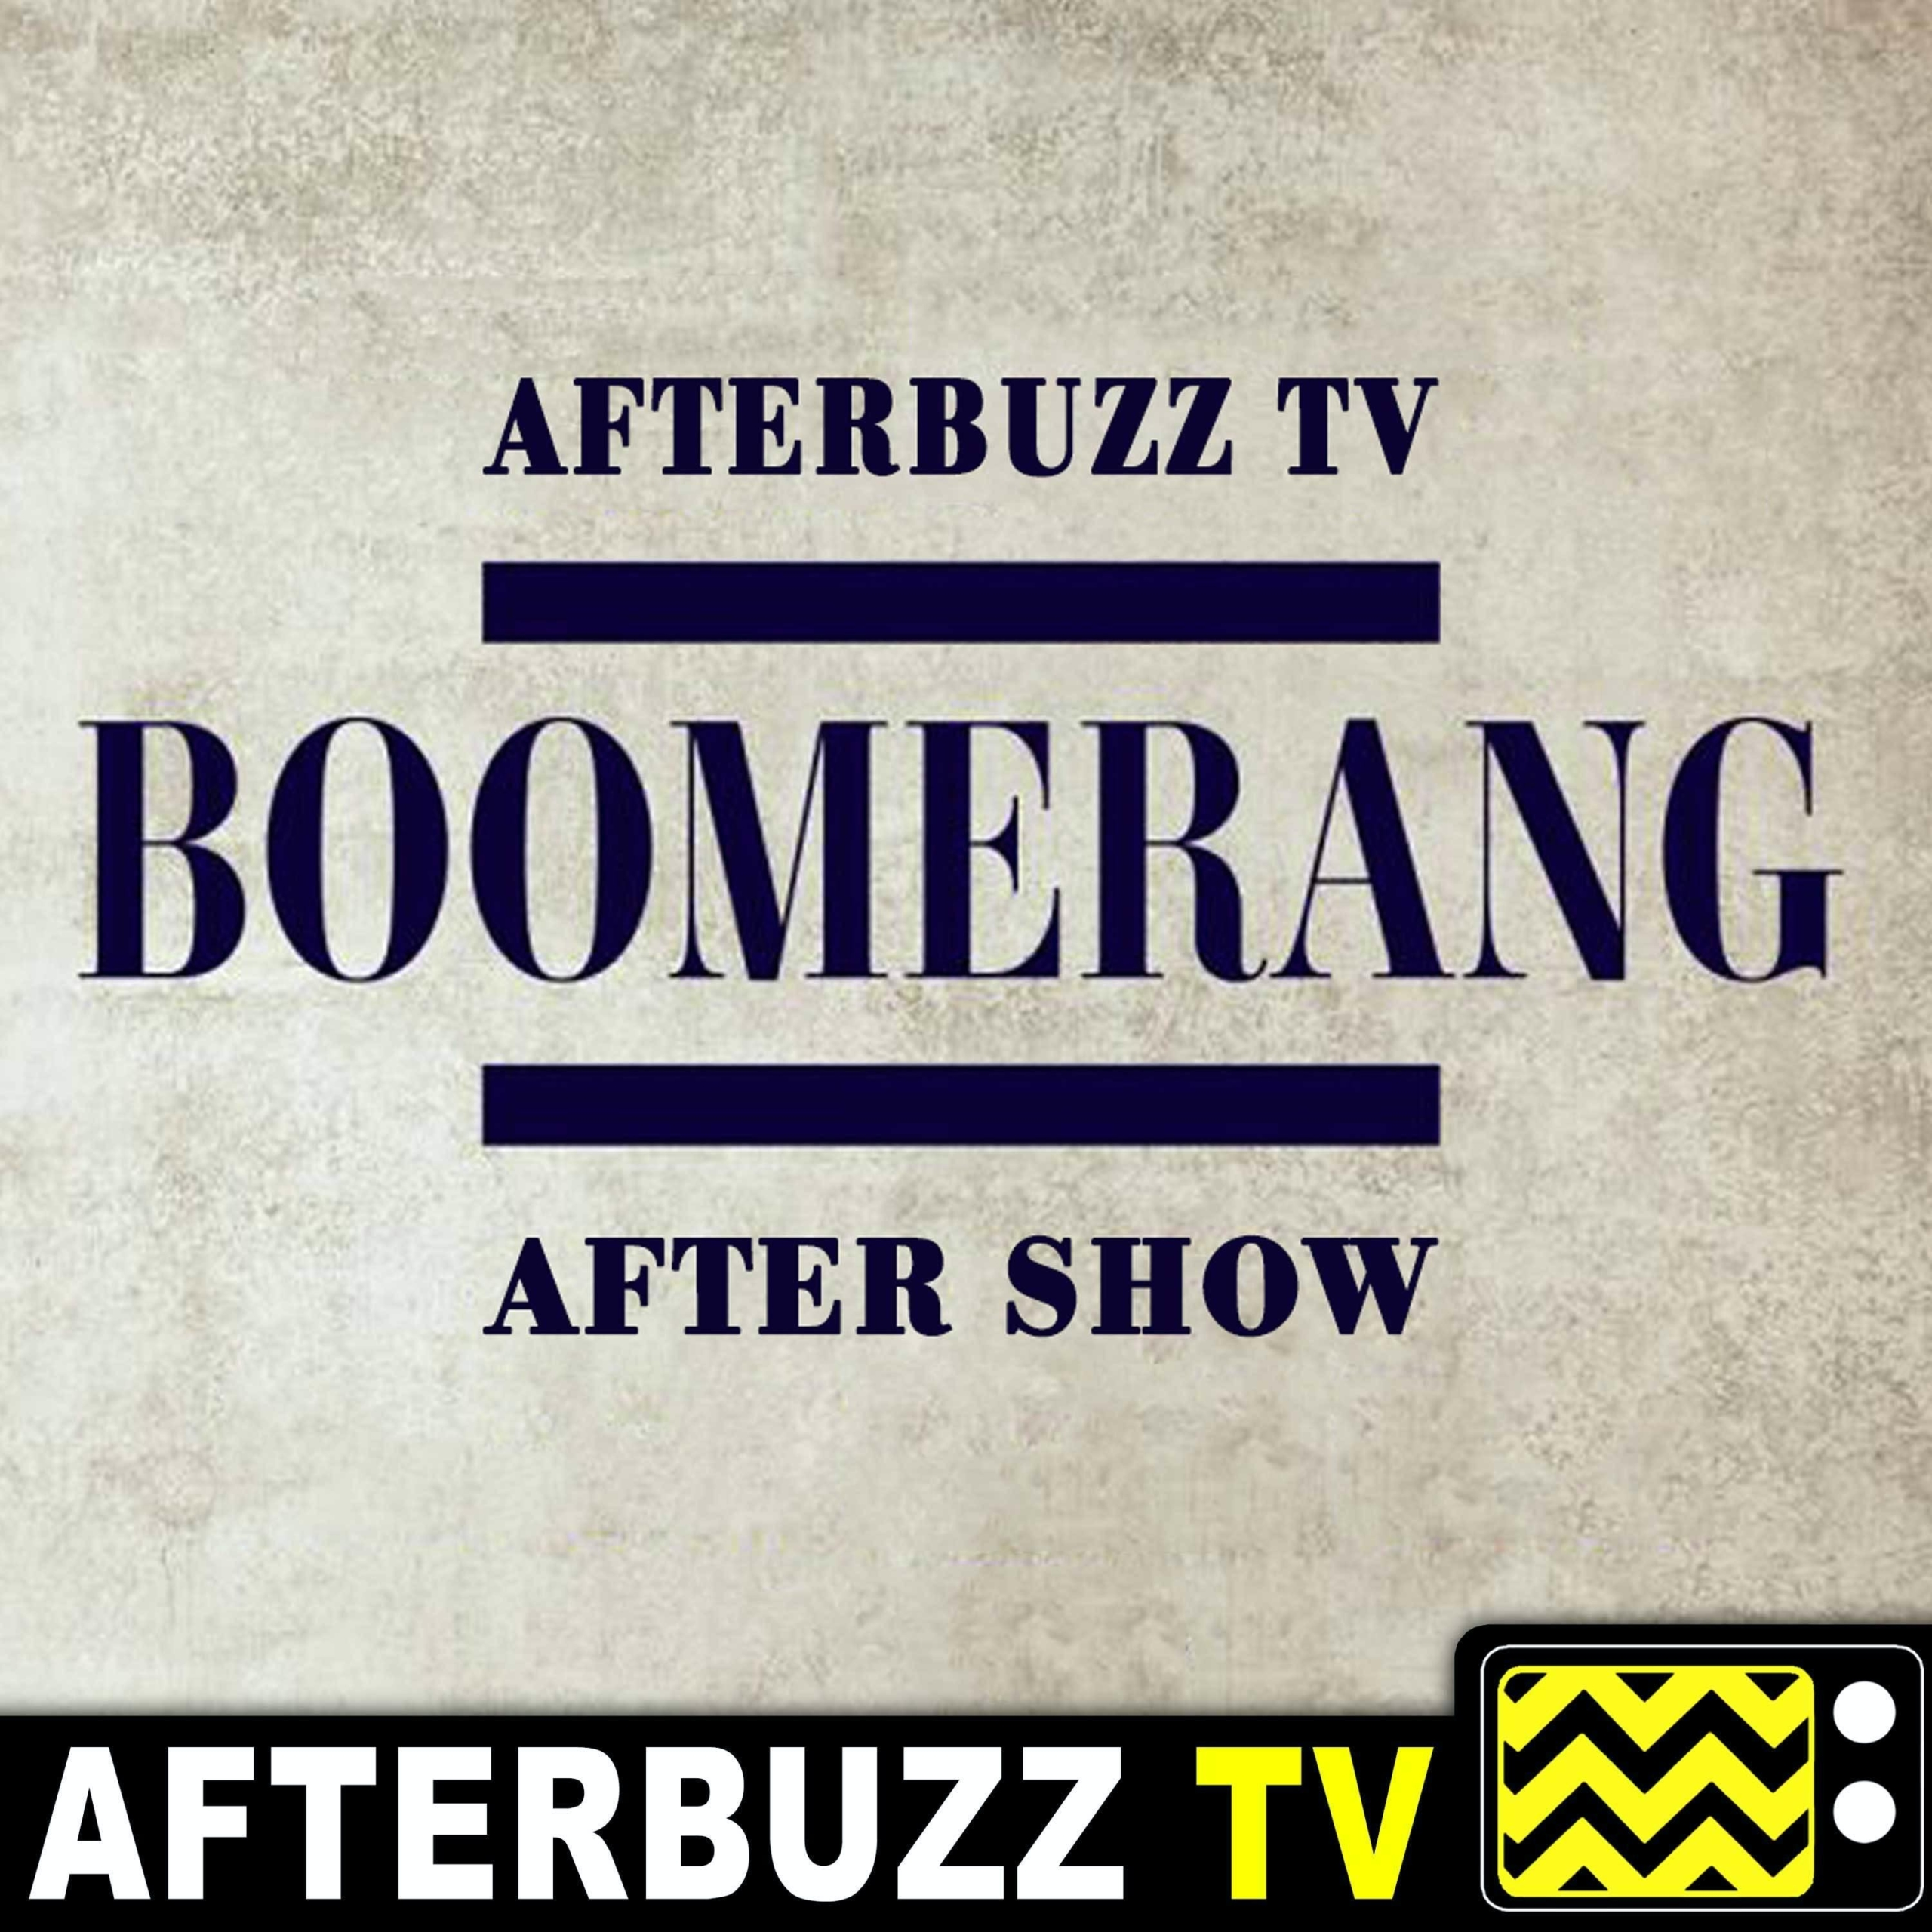 Boomerang S2 E7 & E8 Recap & After Show w/ Leland B. Martin : Season Finale Wrap up Episodes 6,7,8 featuring special guest Leland B Martin